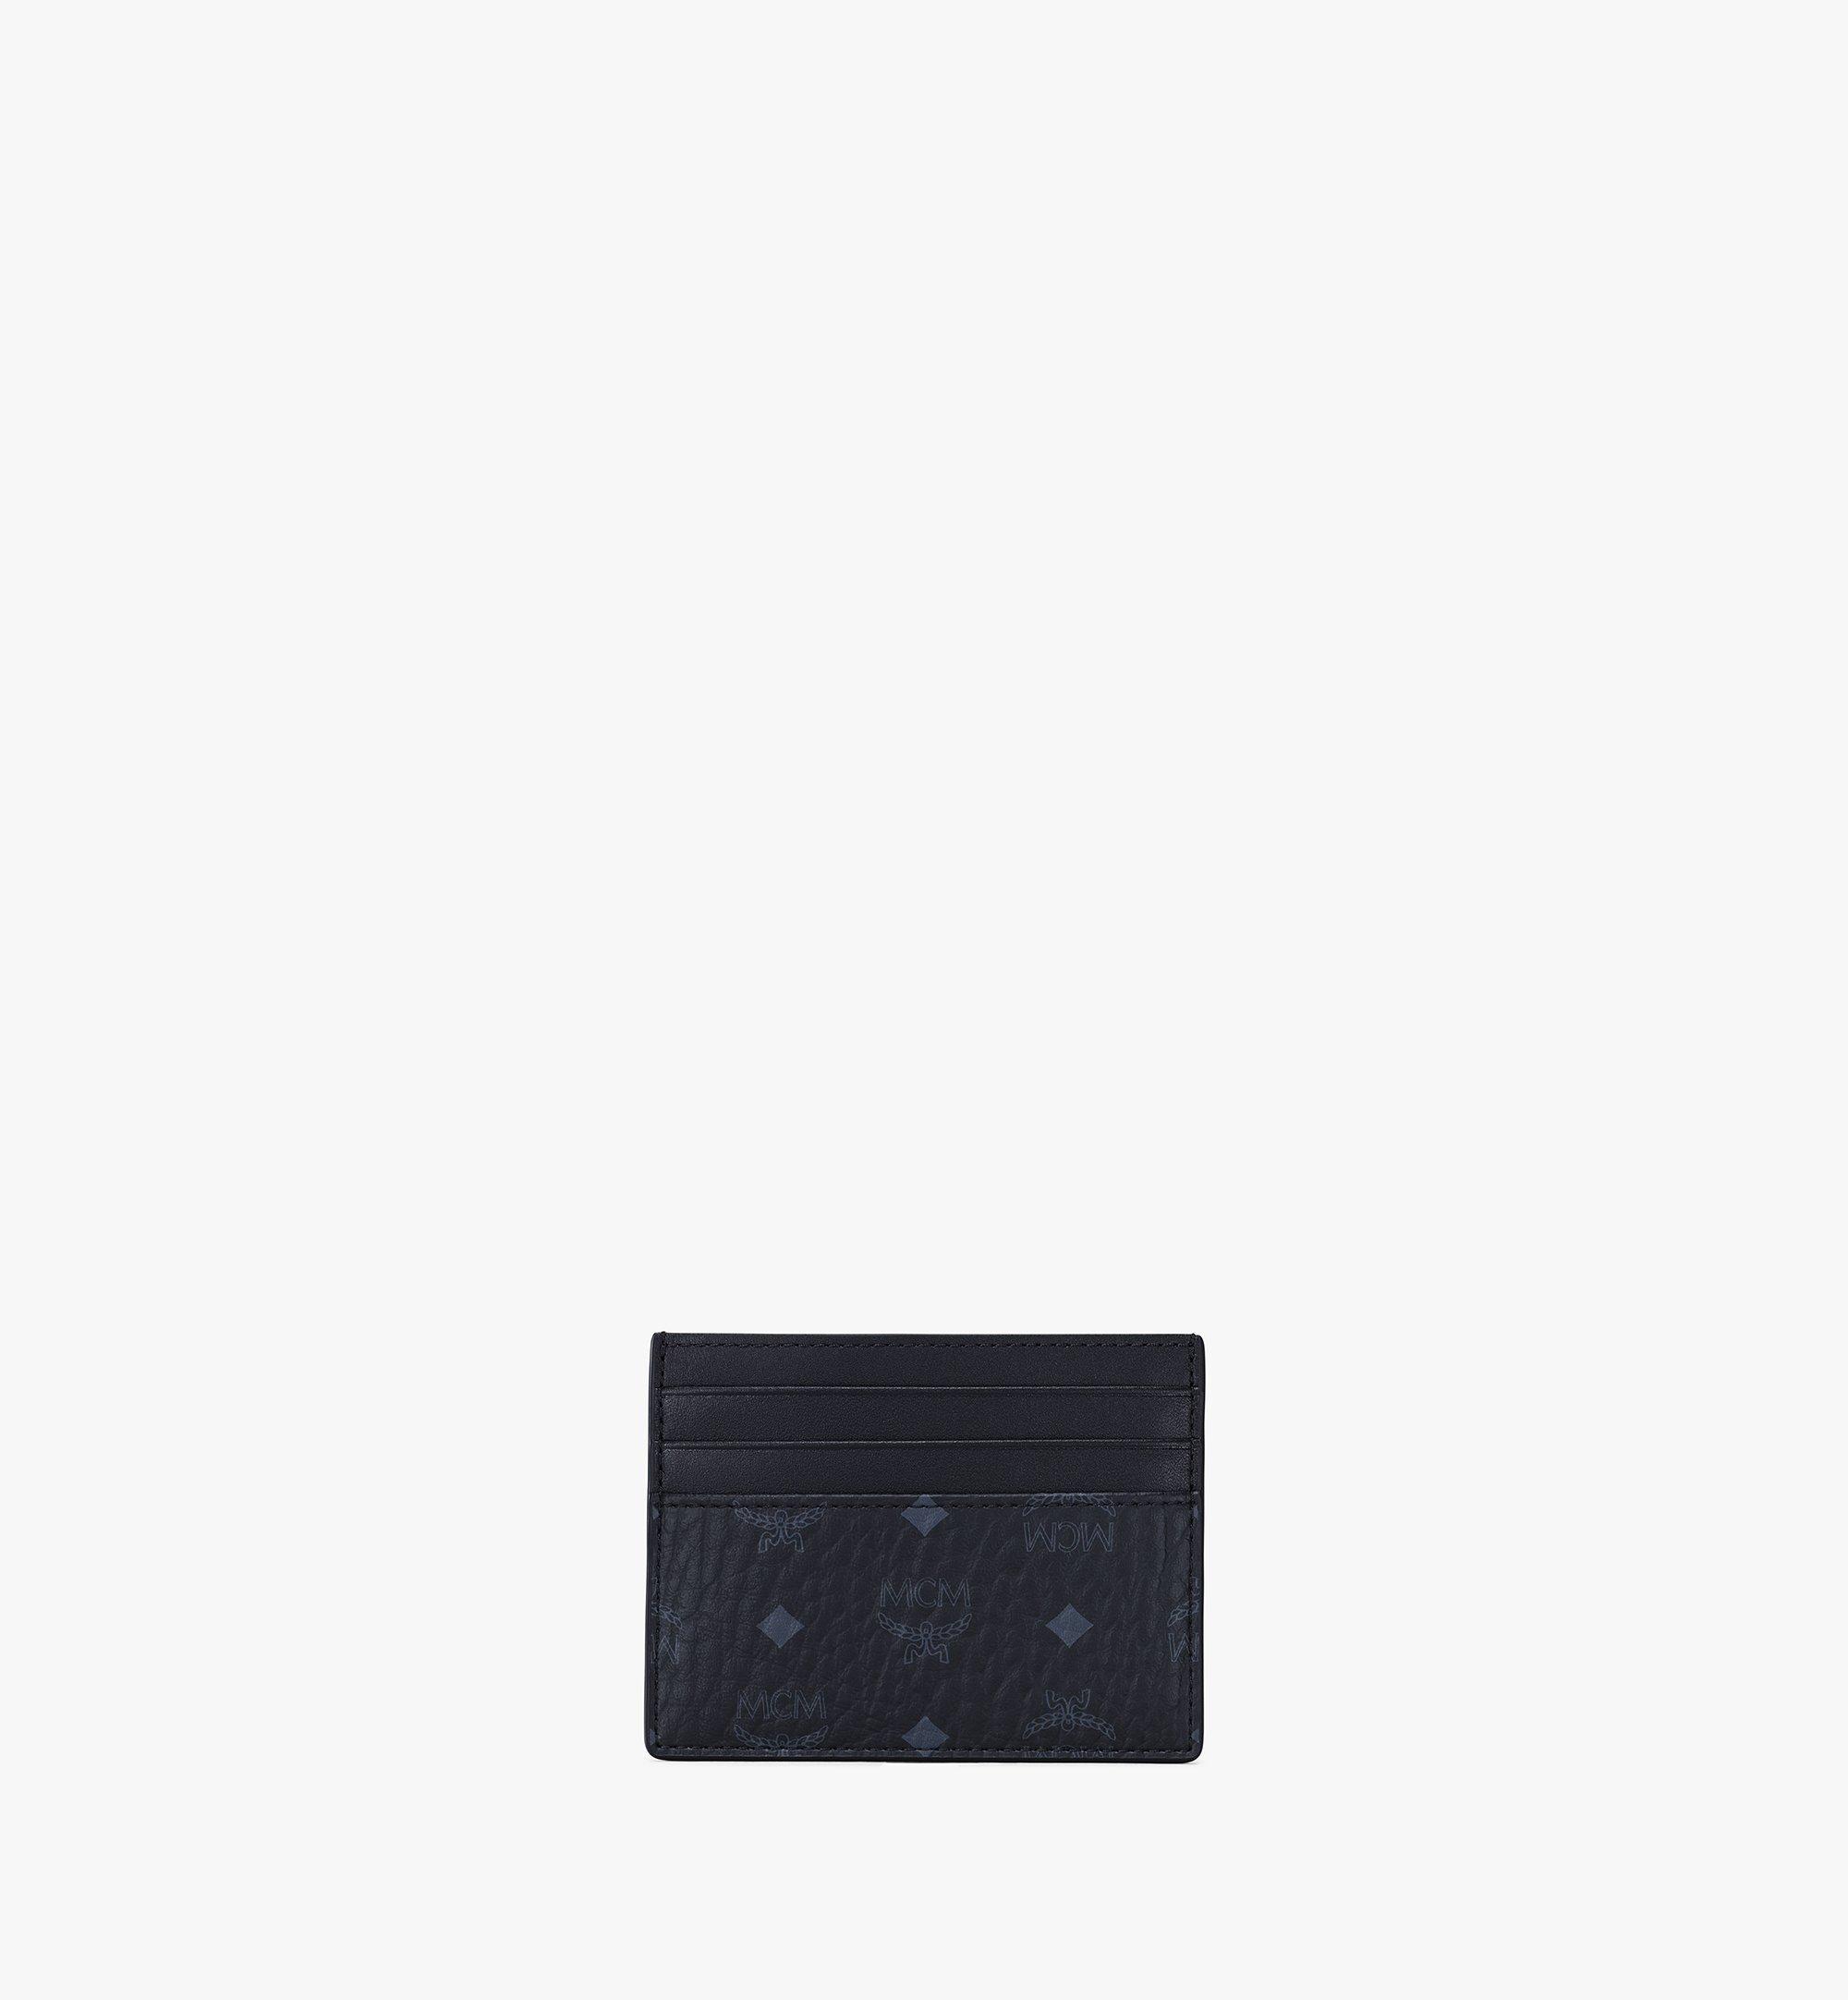 MCM Money Clip Card Case in Visetos Original Black MXCAAVI02BK001 Alternate View 4